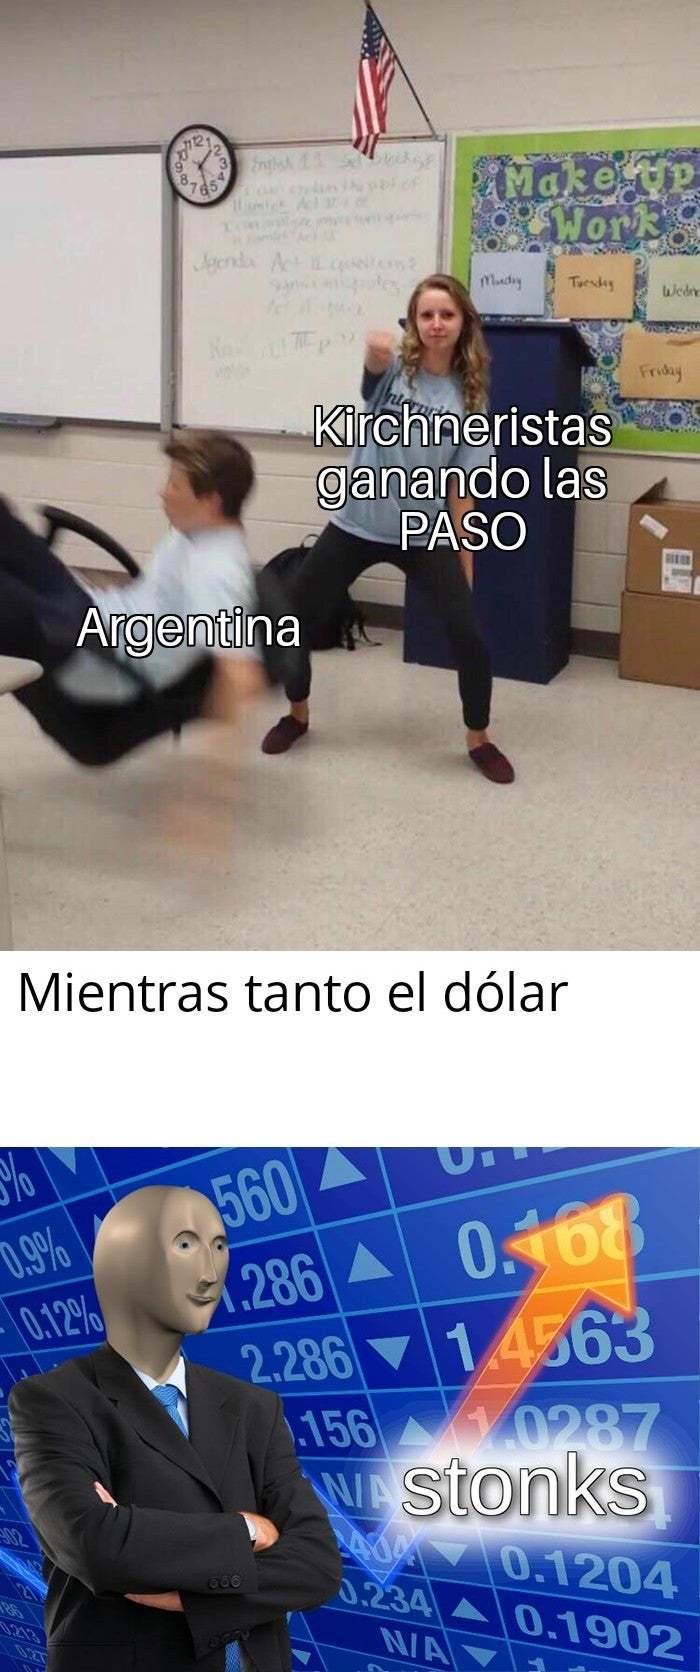 Fmi :ahora mismo Nice >:] - meme